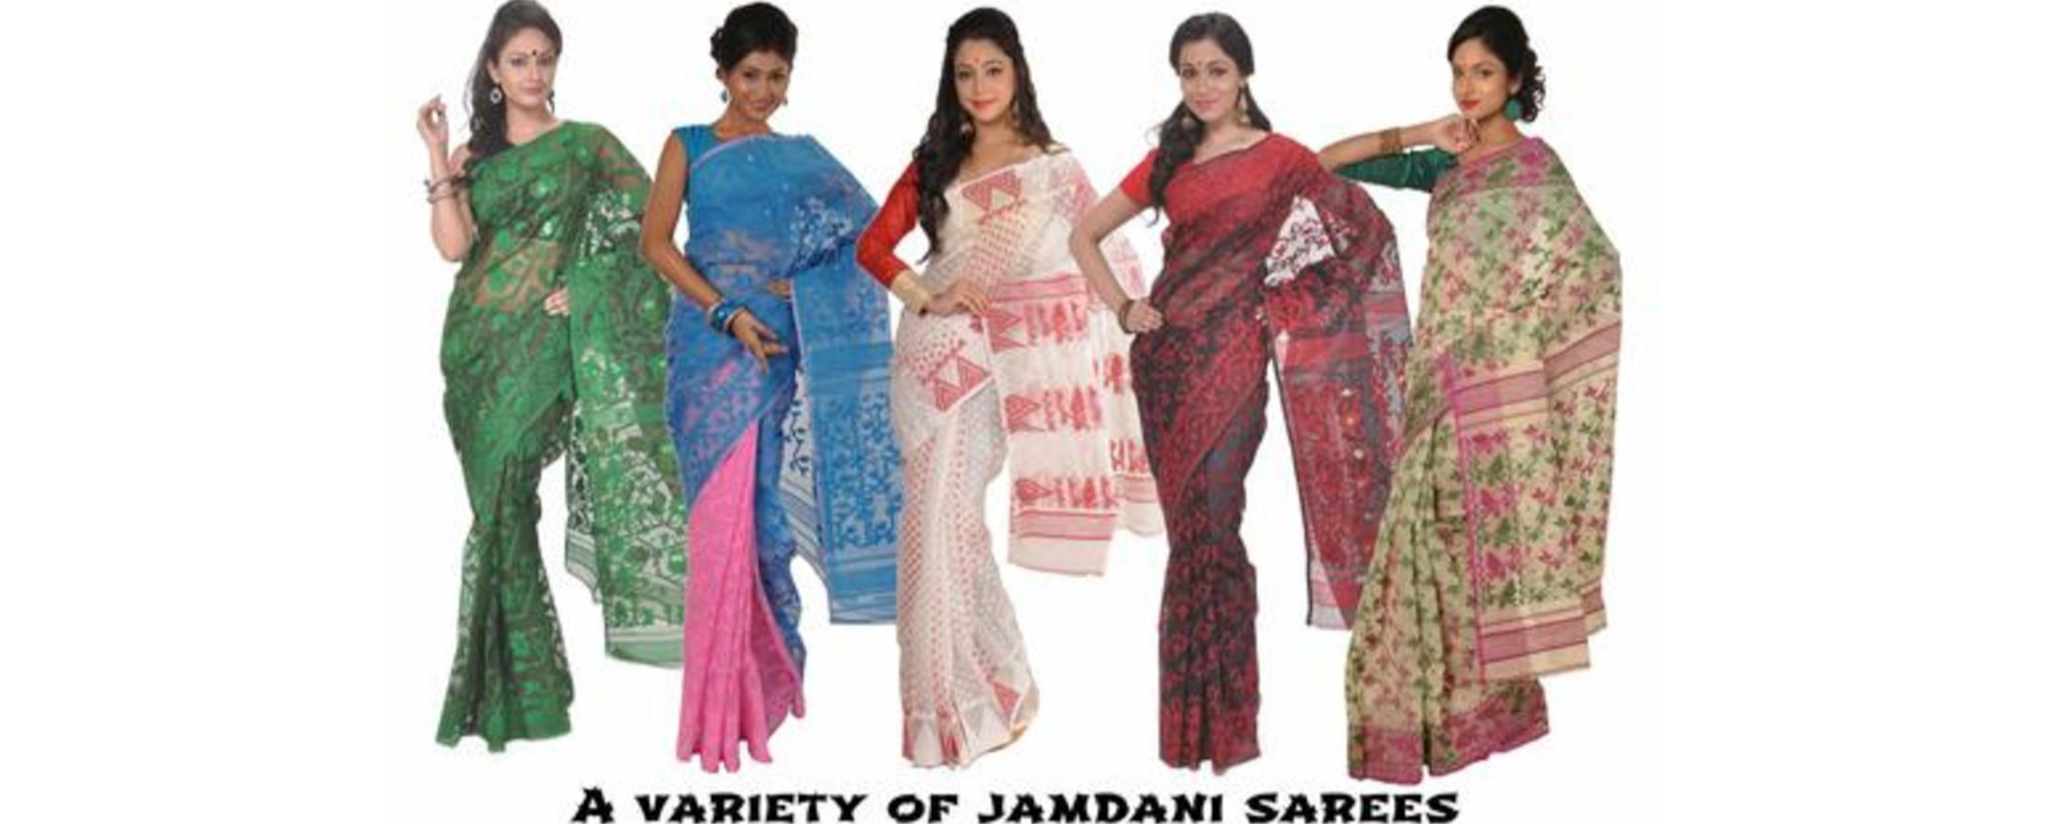 Rashmika Creations - Saree Retailers in Kharghar Sector 13, Navi Mumbai